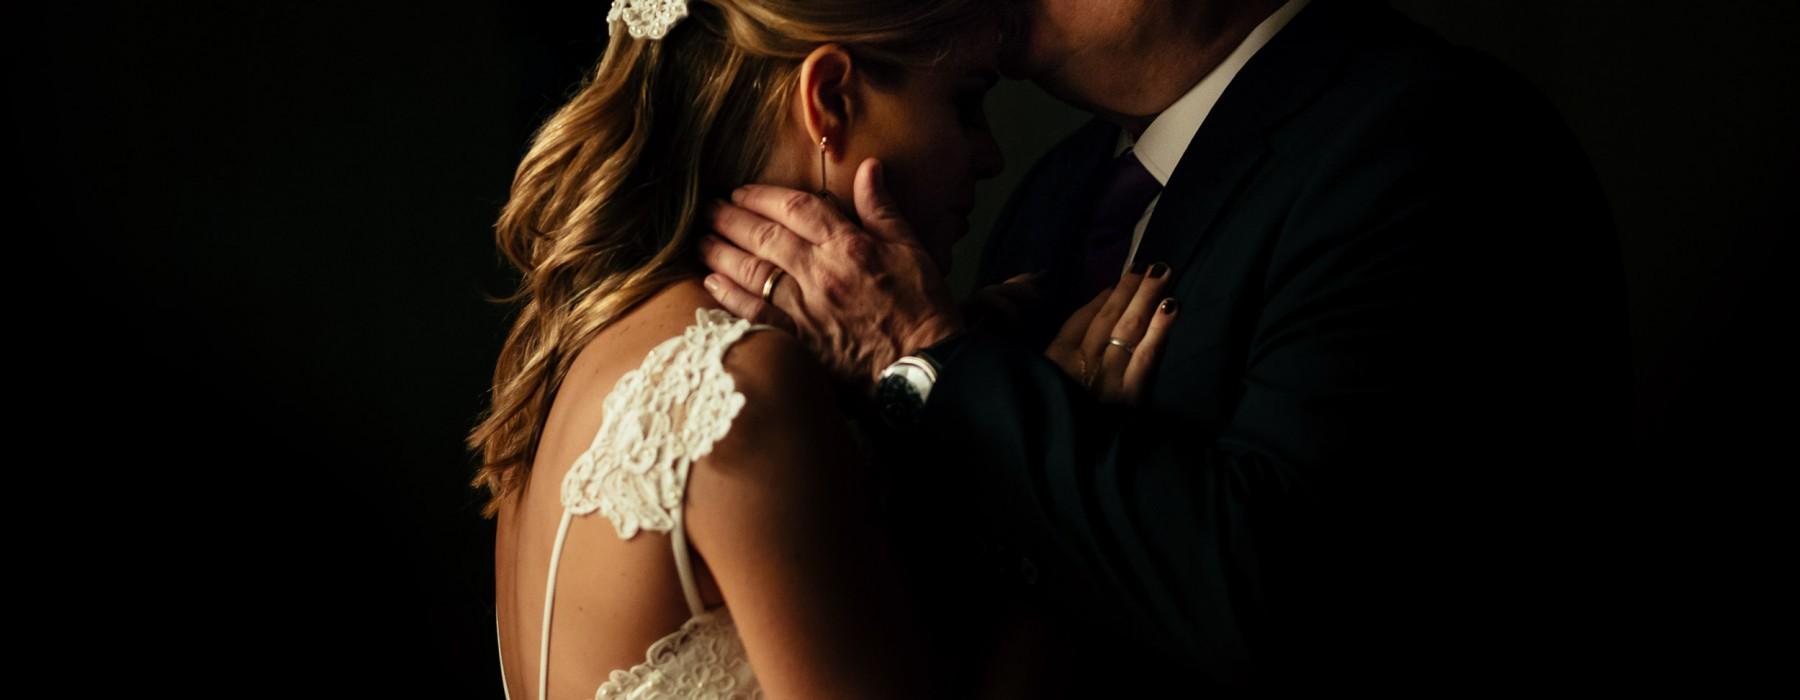 renato dpaula noiva pai beijo casamento emocao fotografia